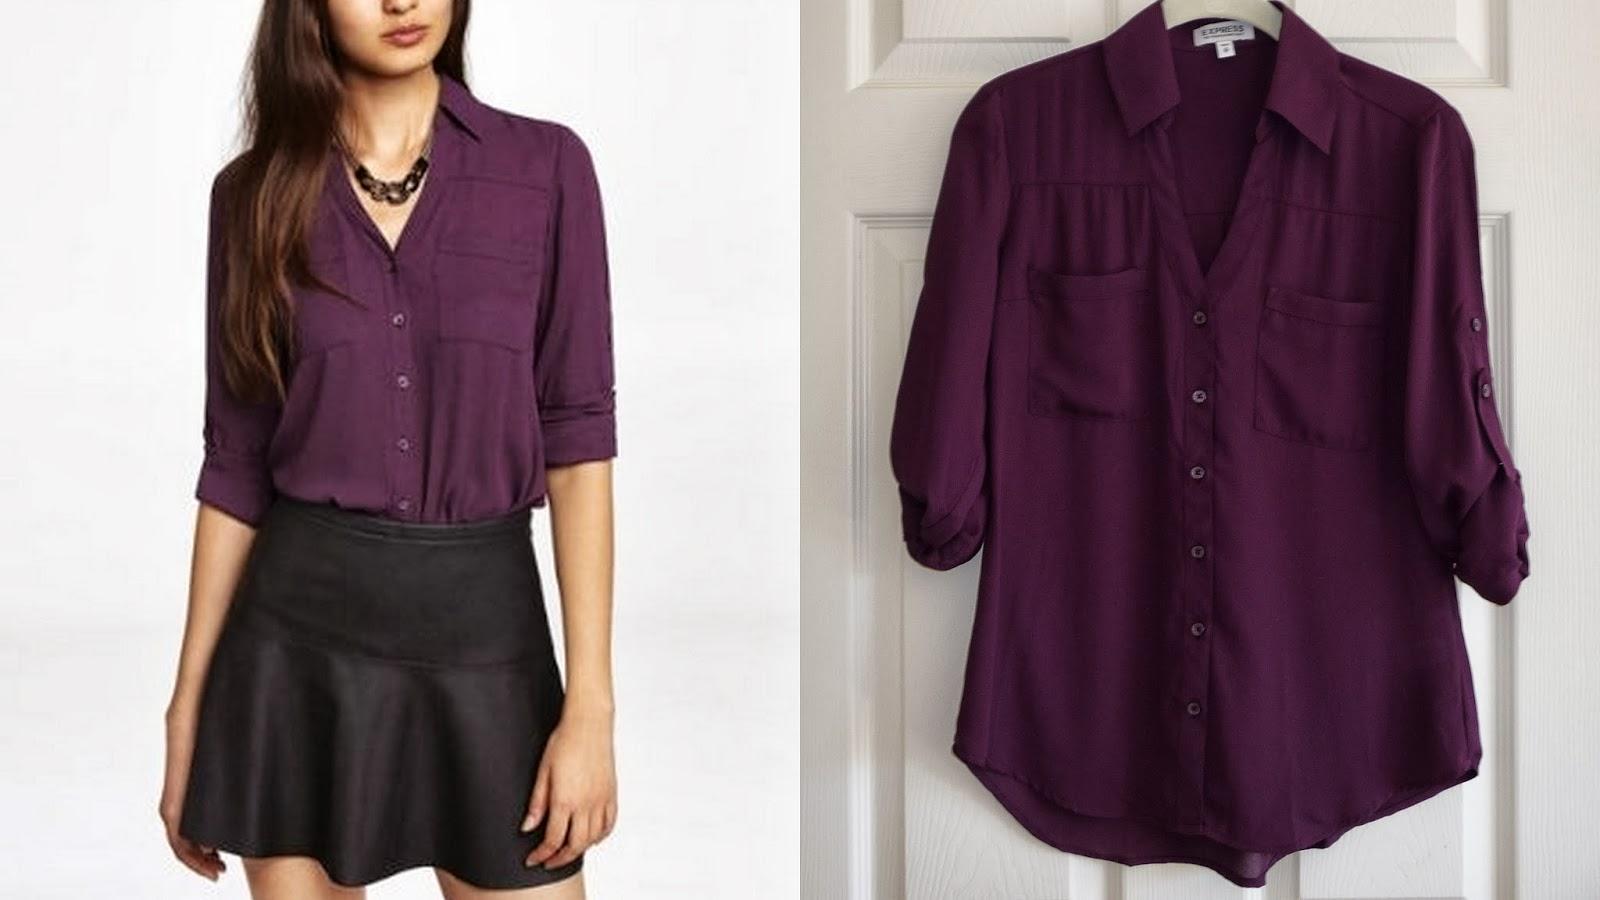 Express portofino shirt, blouse, top, wine color